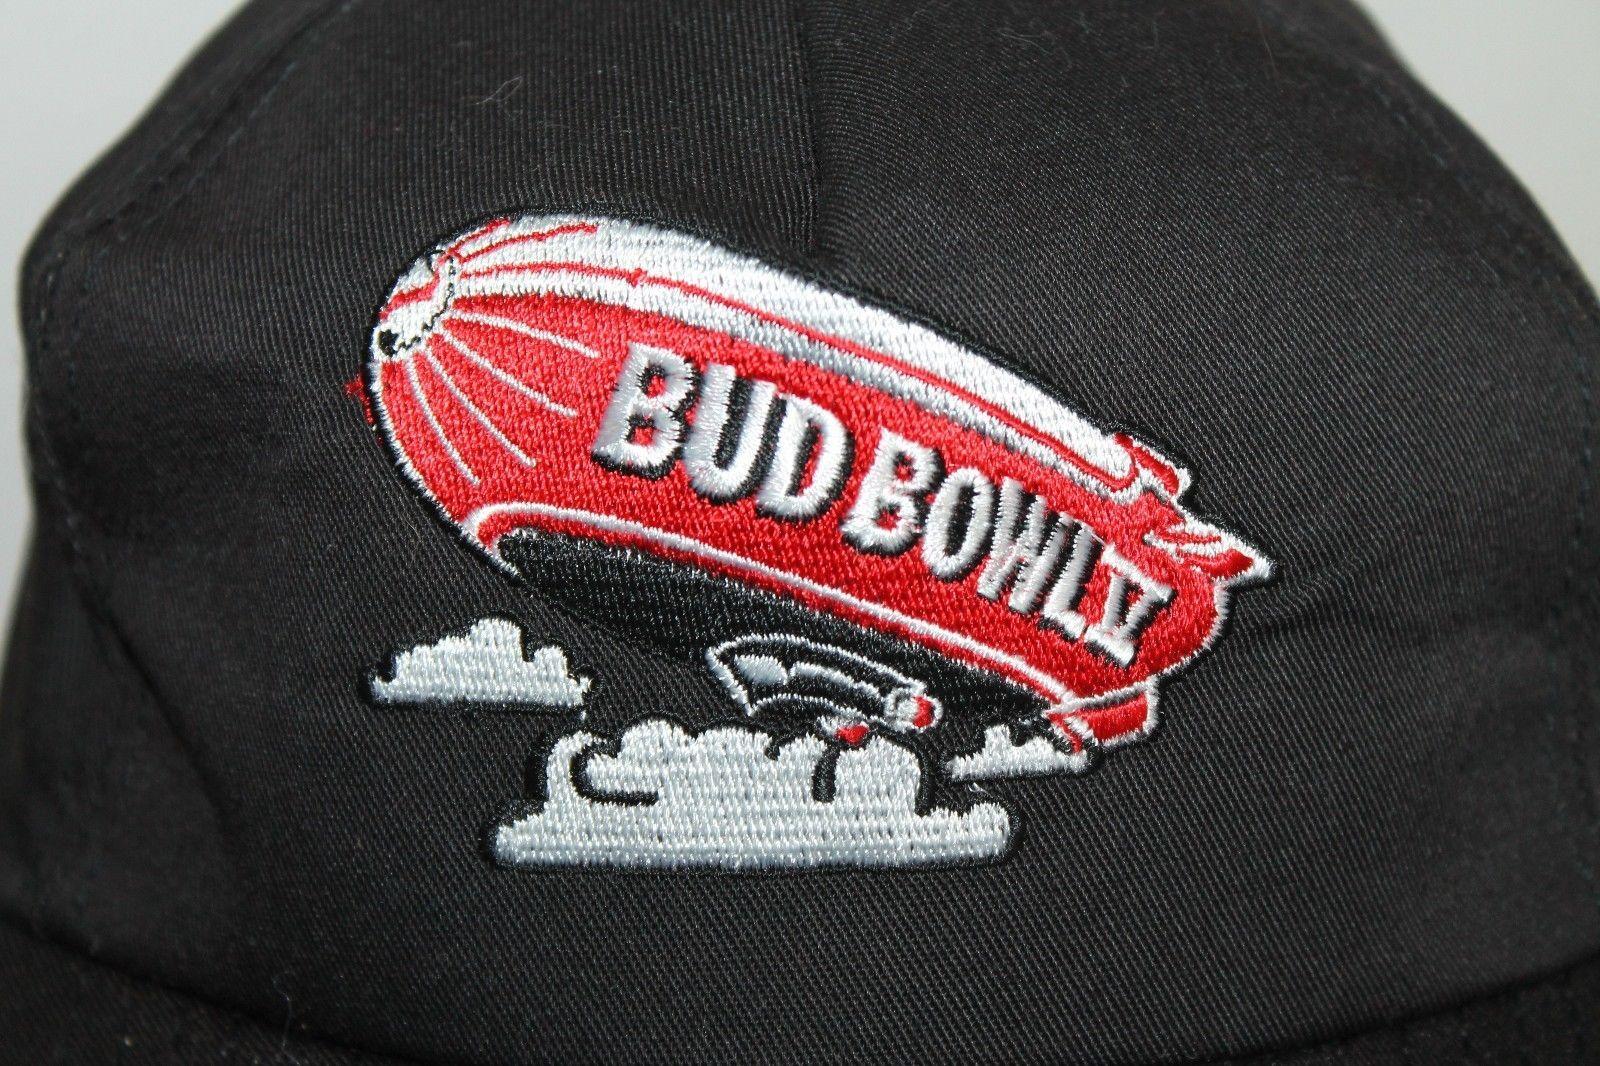 Budweiser Bud Bowl 5 V Blimp Snapback Hat Cap NFL Football Superbowl XXVII 27